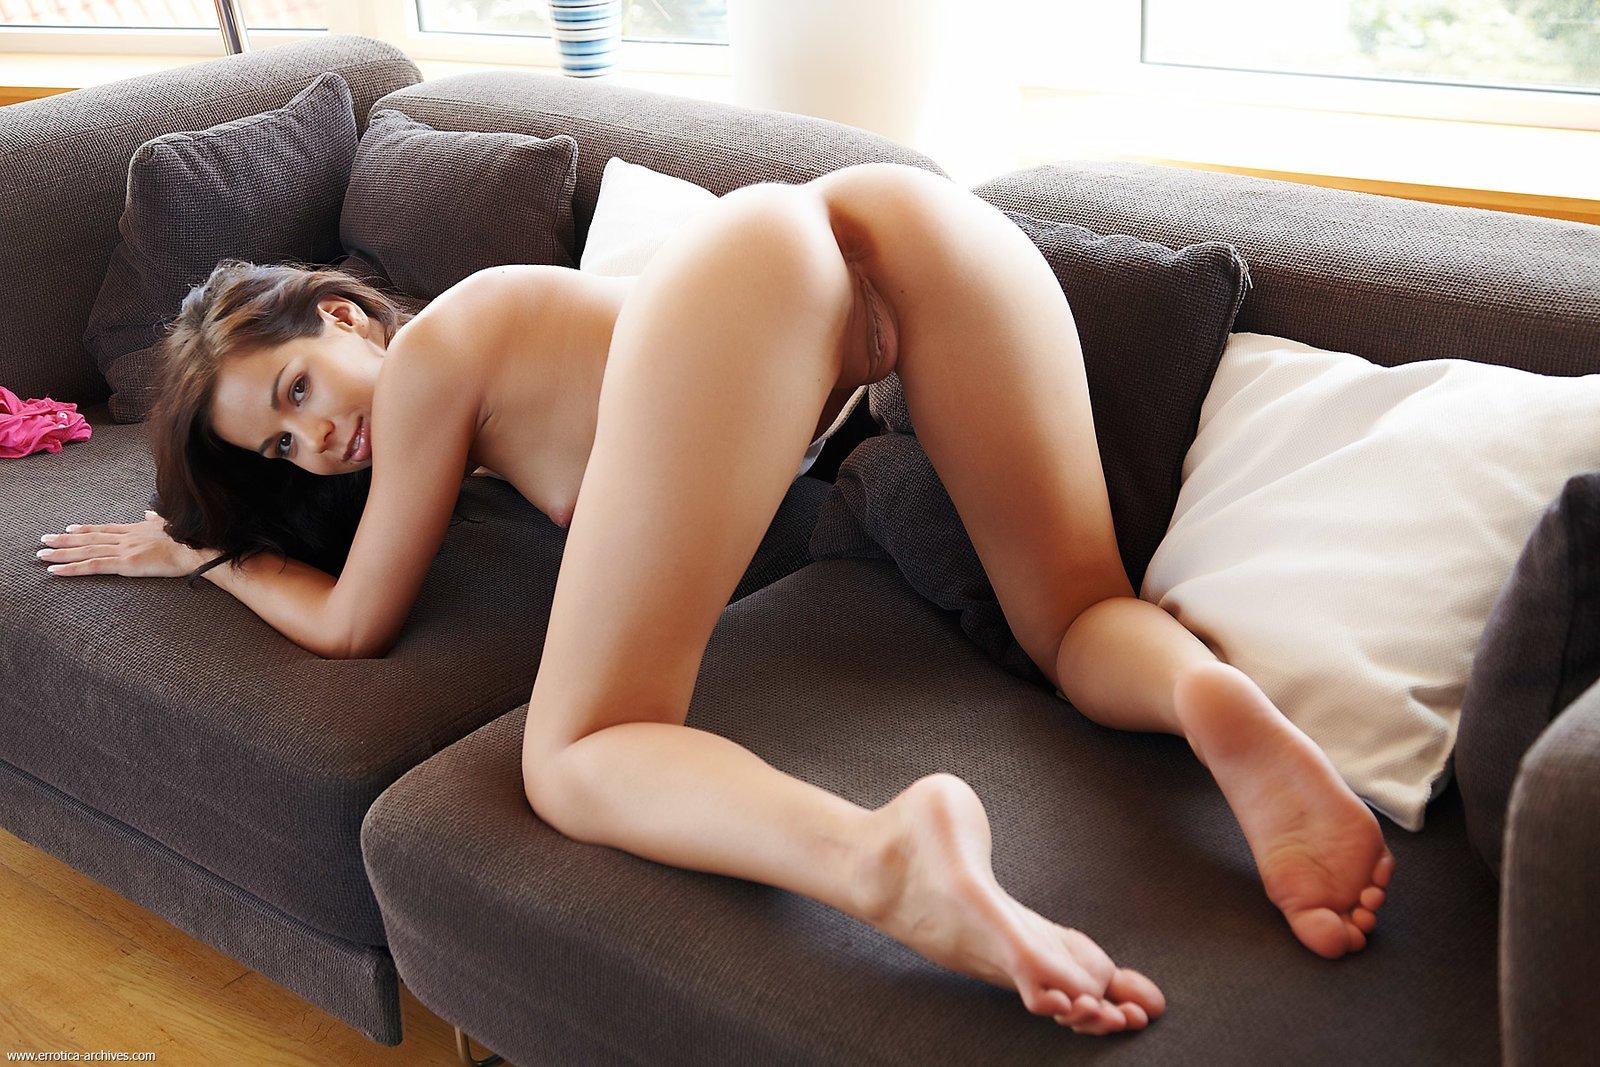 Молодая красавица раздвинула ножки лежа на диване